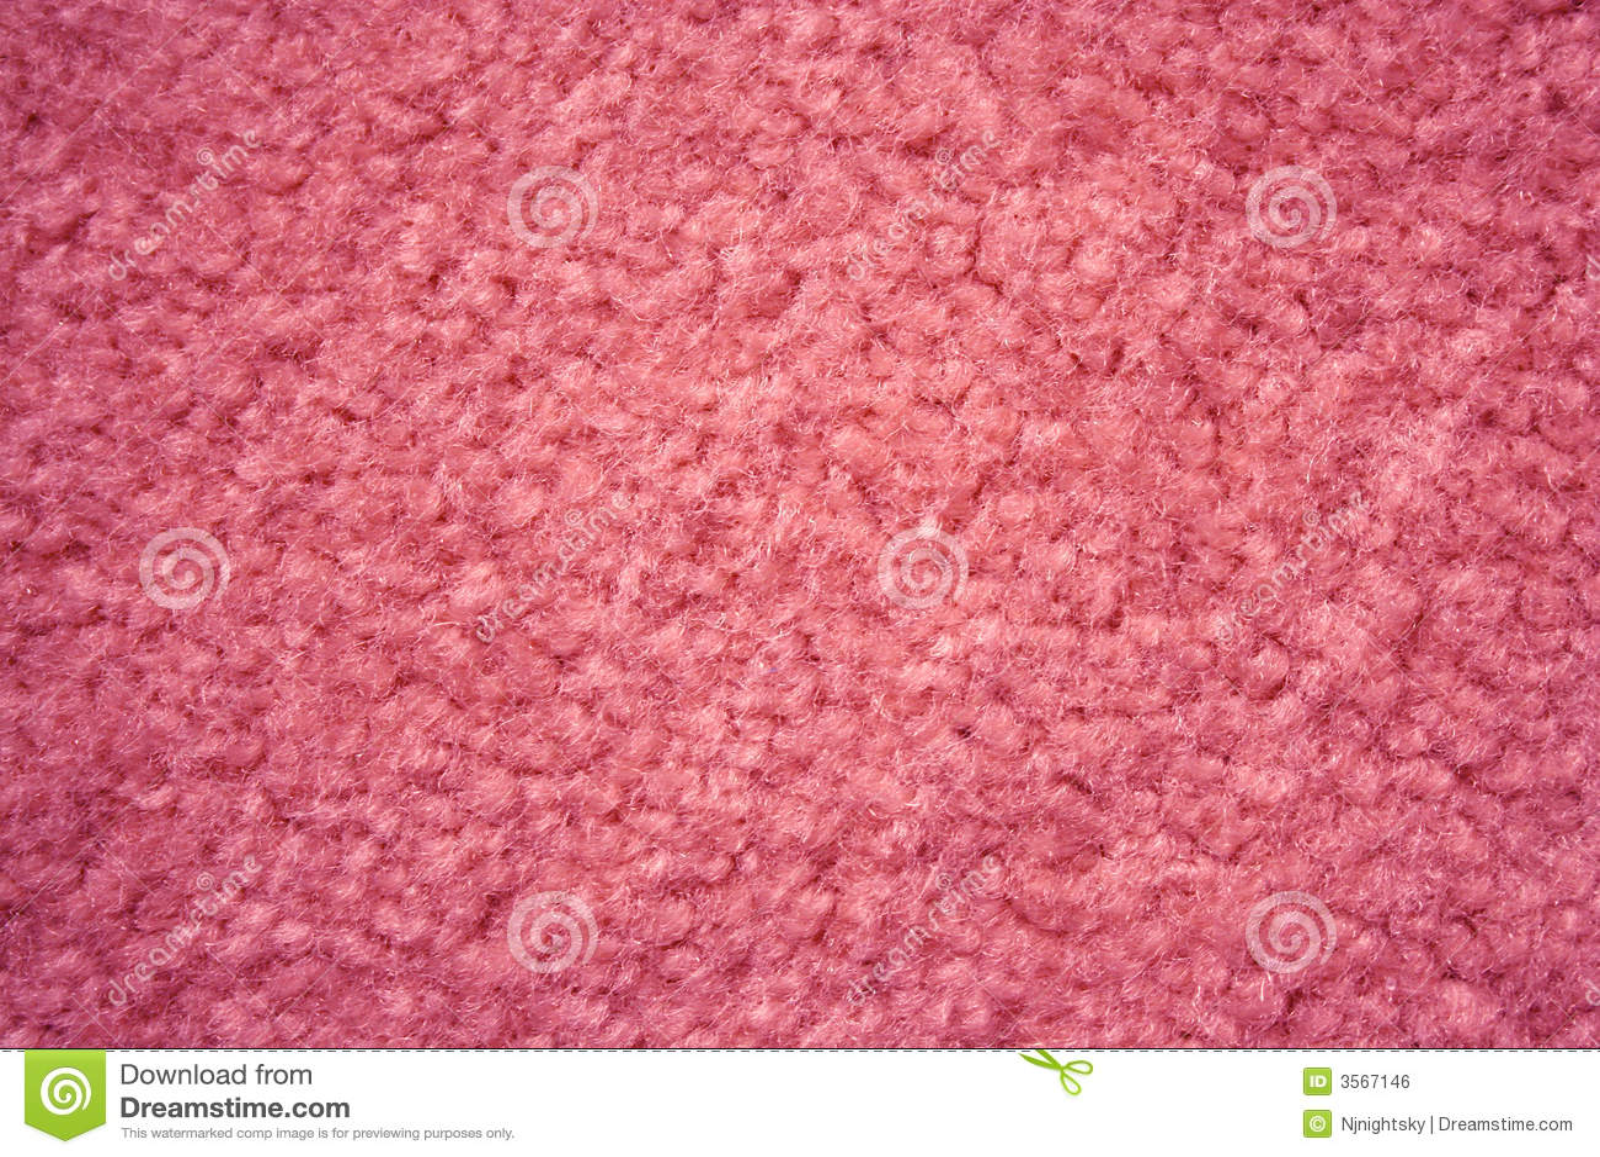 Pink Carpet Background Royalty Free Stock Image Image